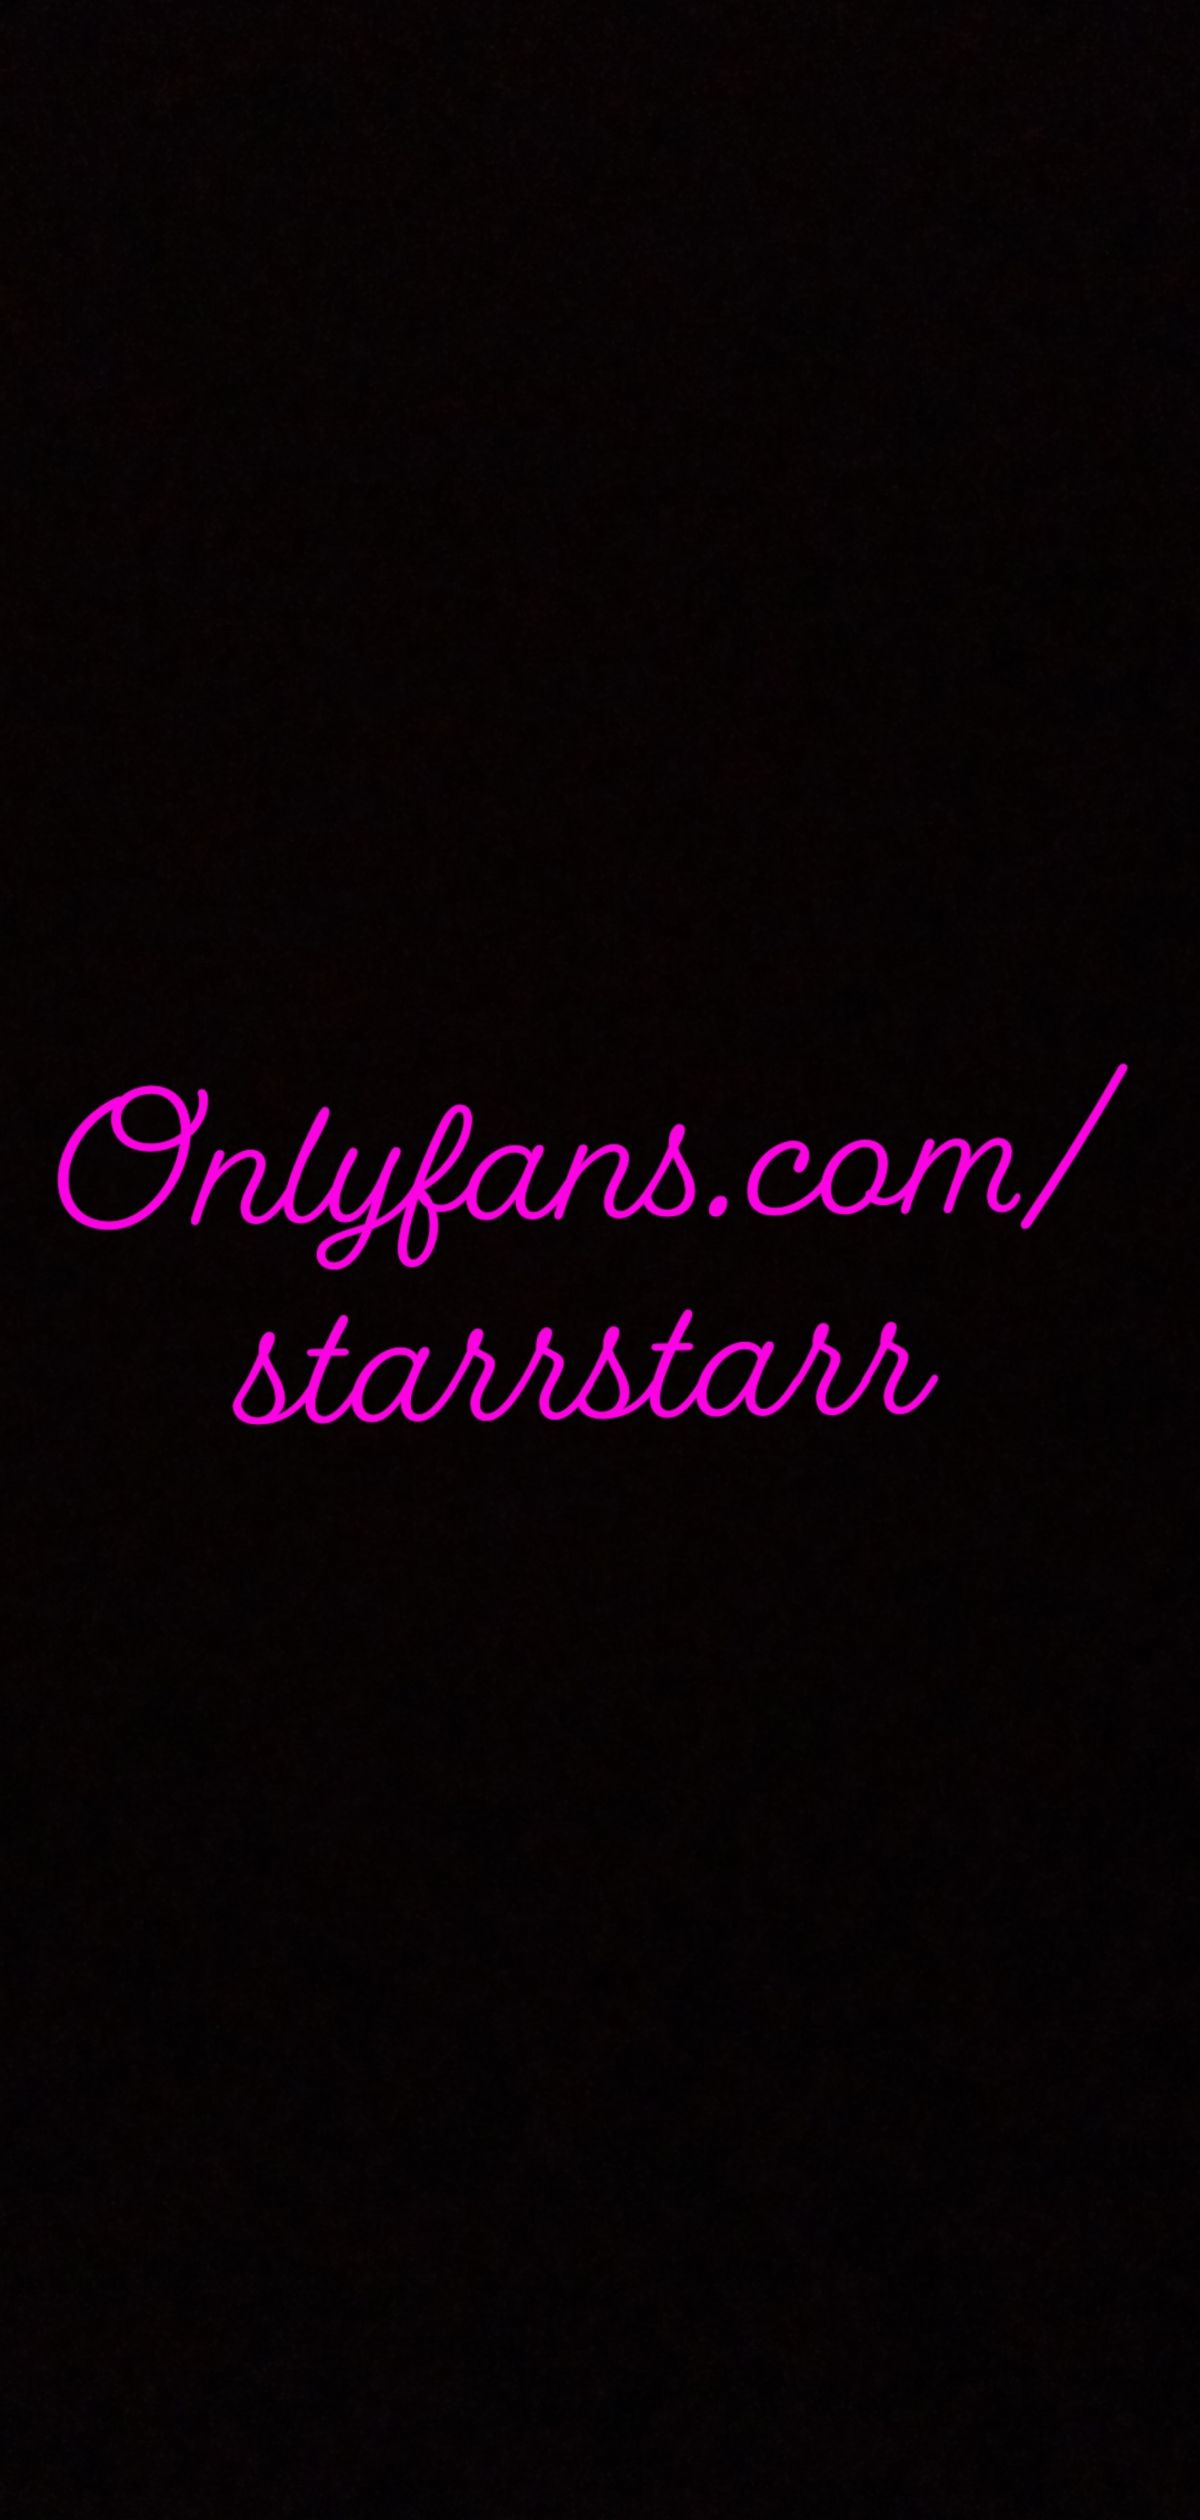 @starrstarr